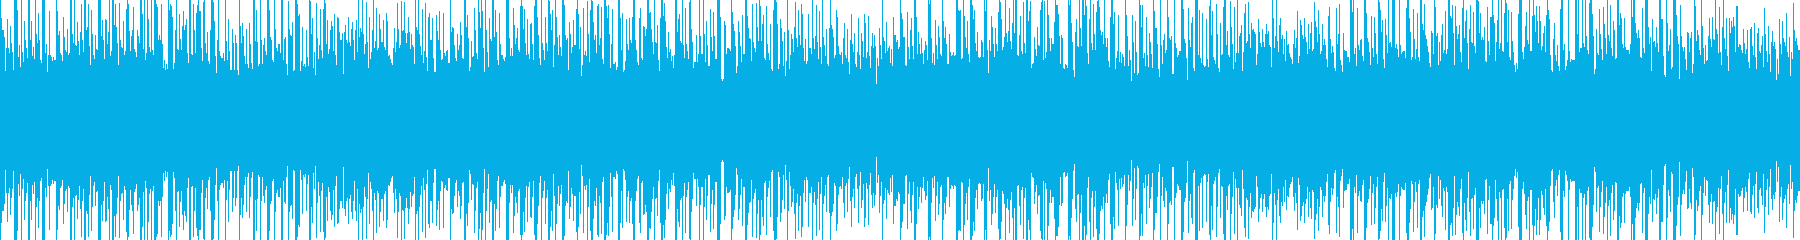 EDM風なお祭りの音楽 1分ぴったり の再生済みの波形